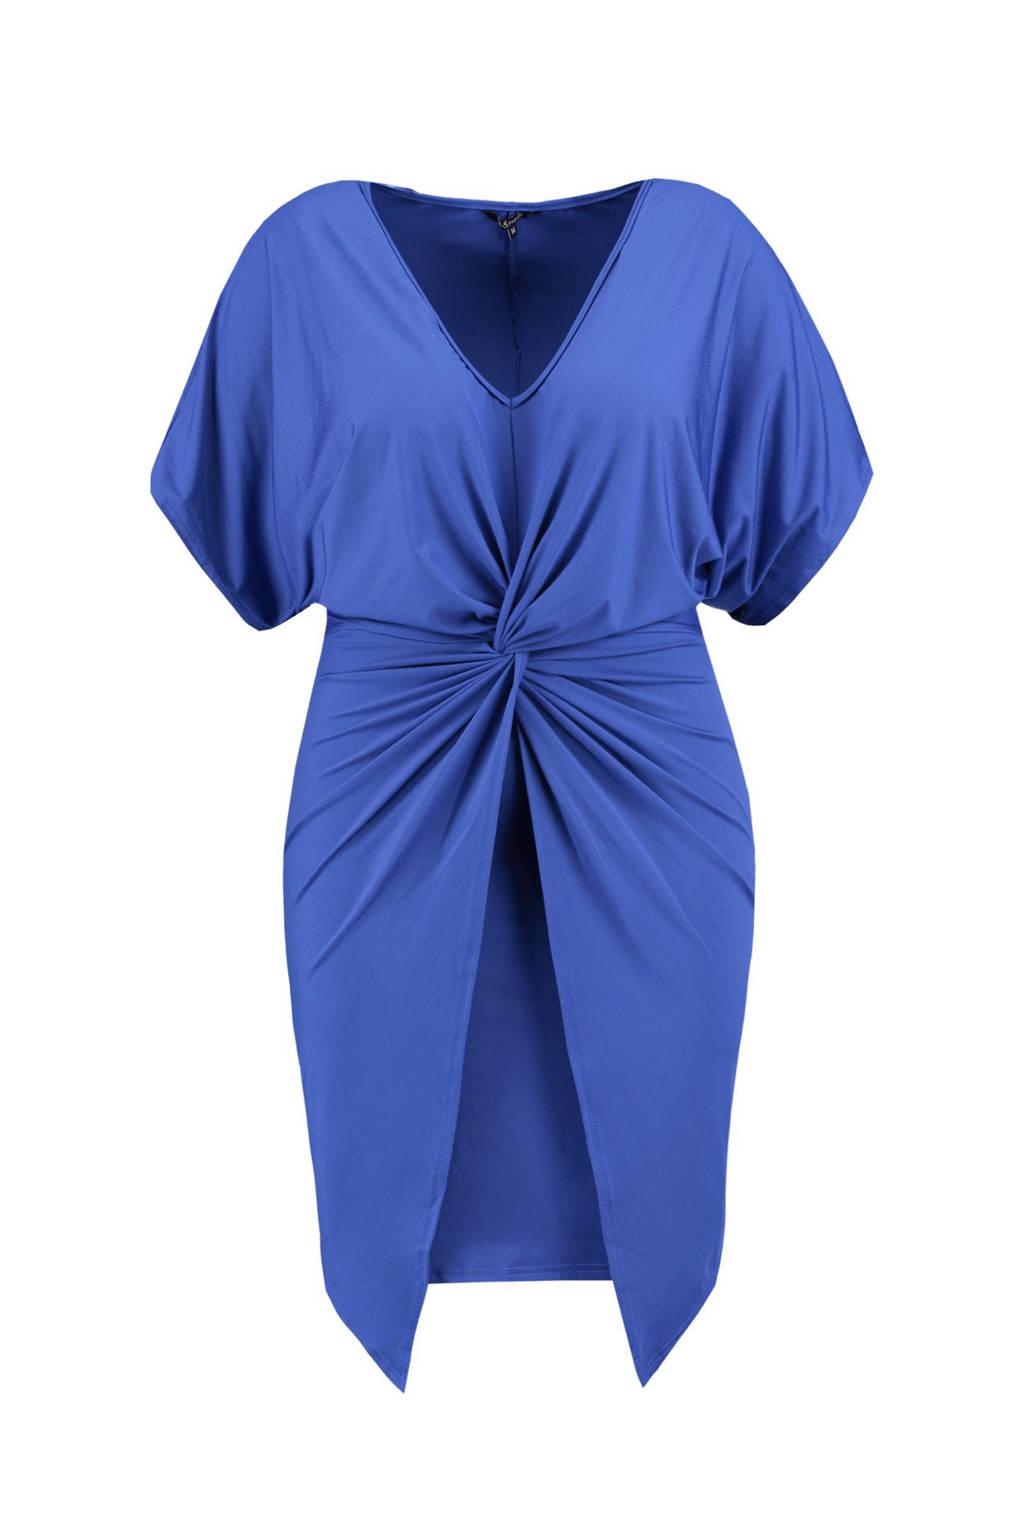 MS Mode jurk blauw, Blauw